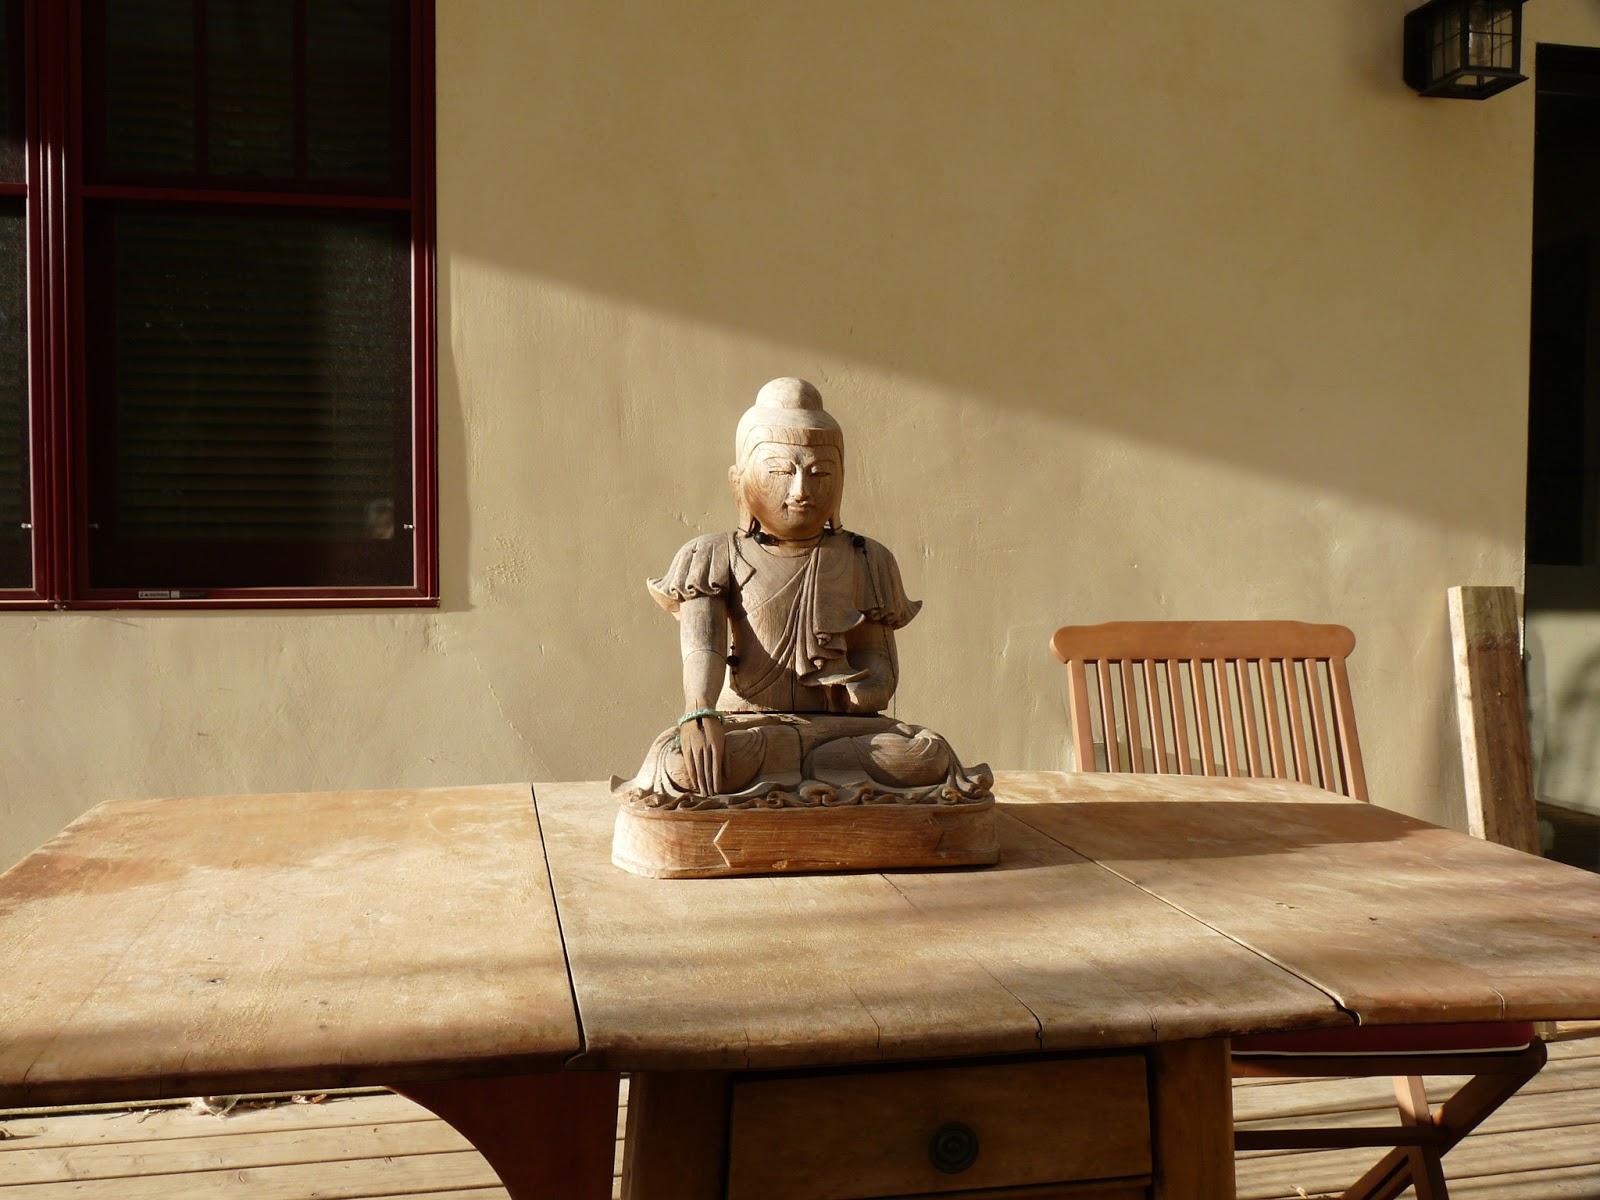 cypress buddhist singles Search for retreats in california (ca  sacred geometry ,senior ,silence,singles,spa,spiritual  anglican,baha'i,baptist,benedictine,buddhist.